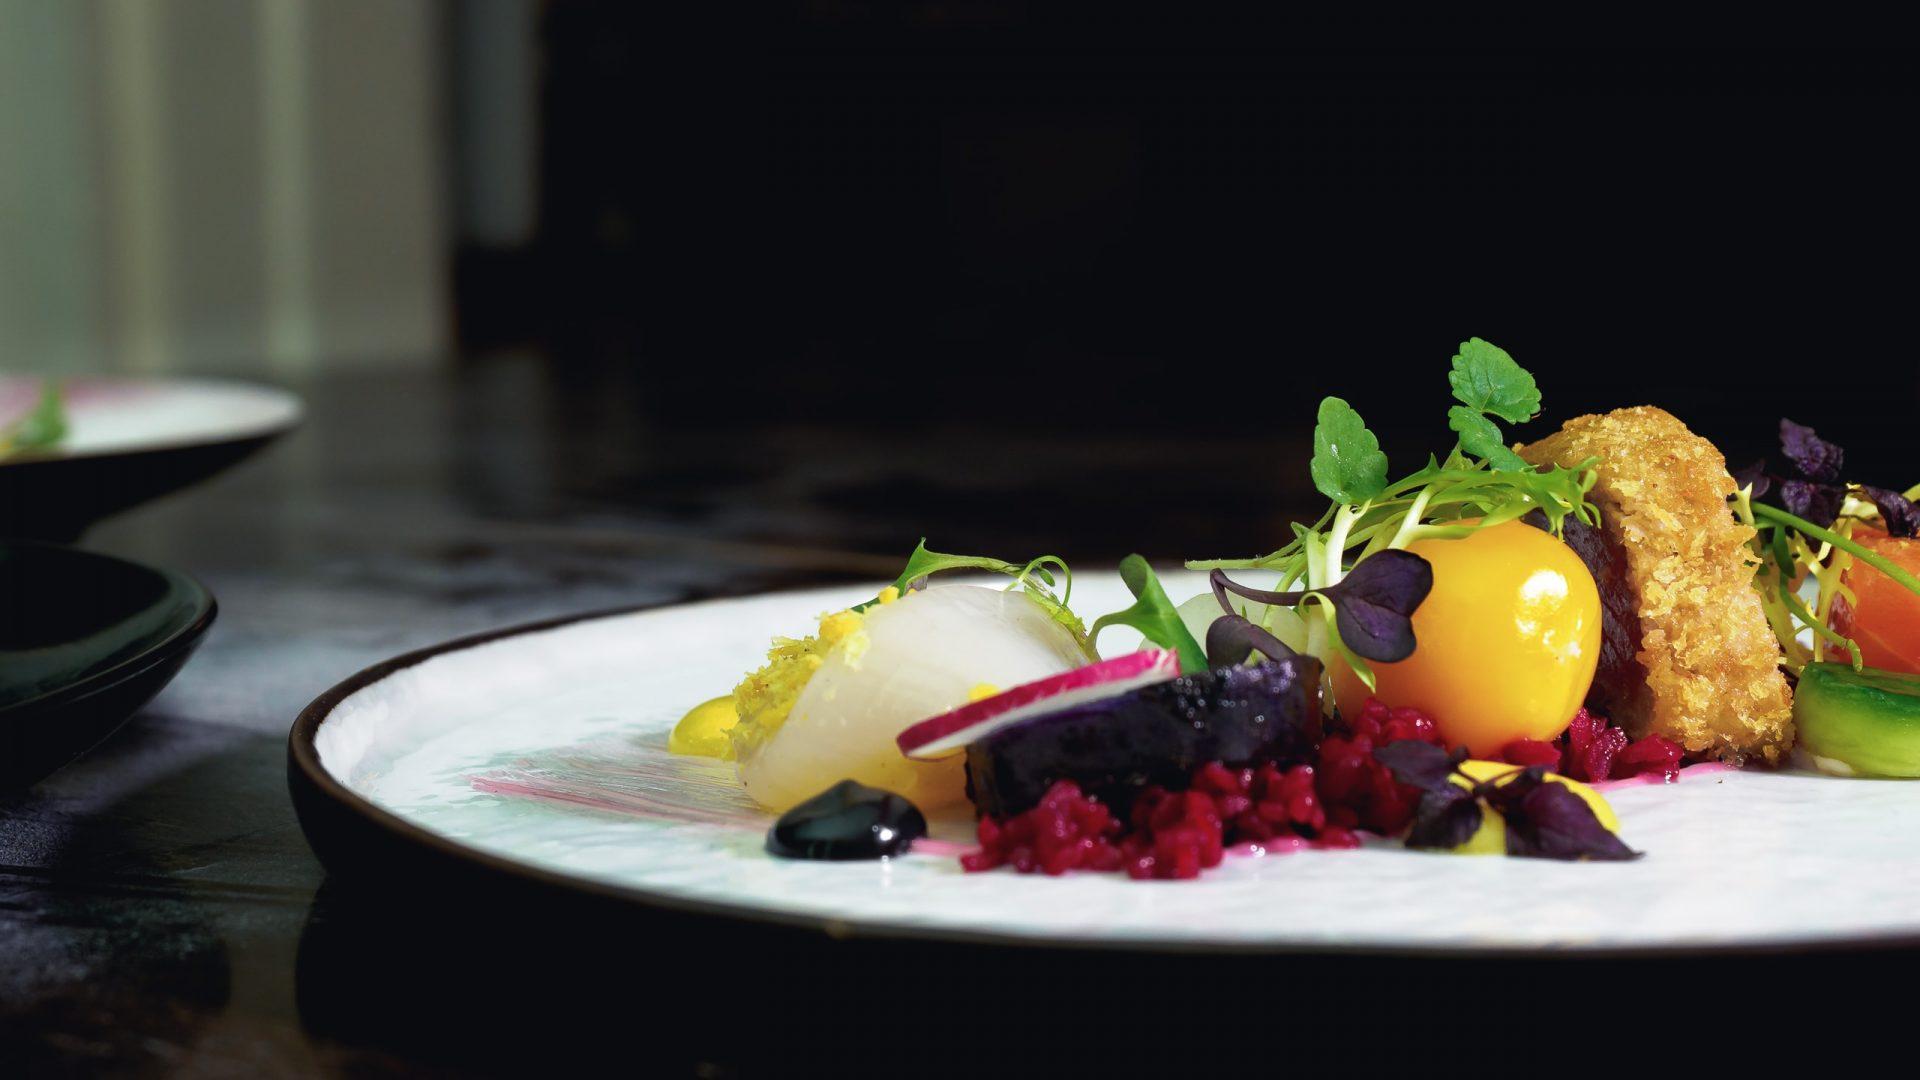 Afbeelding Zala's Restaurant - Theaterwijzer